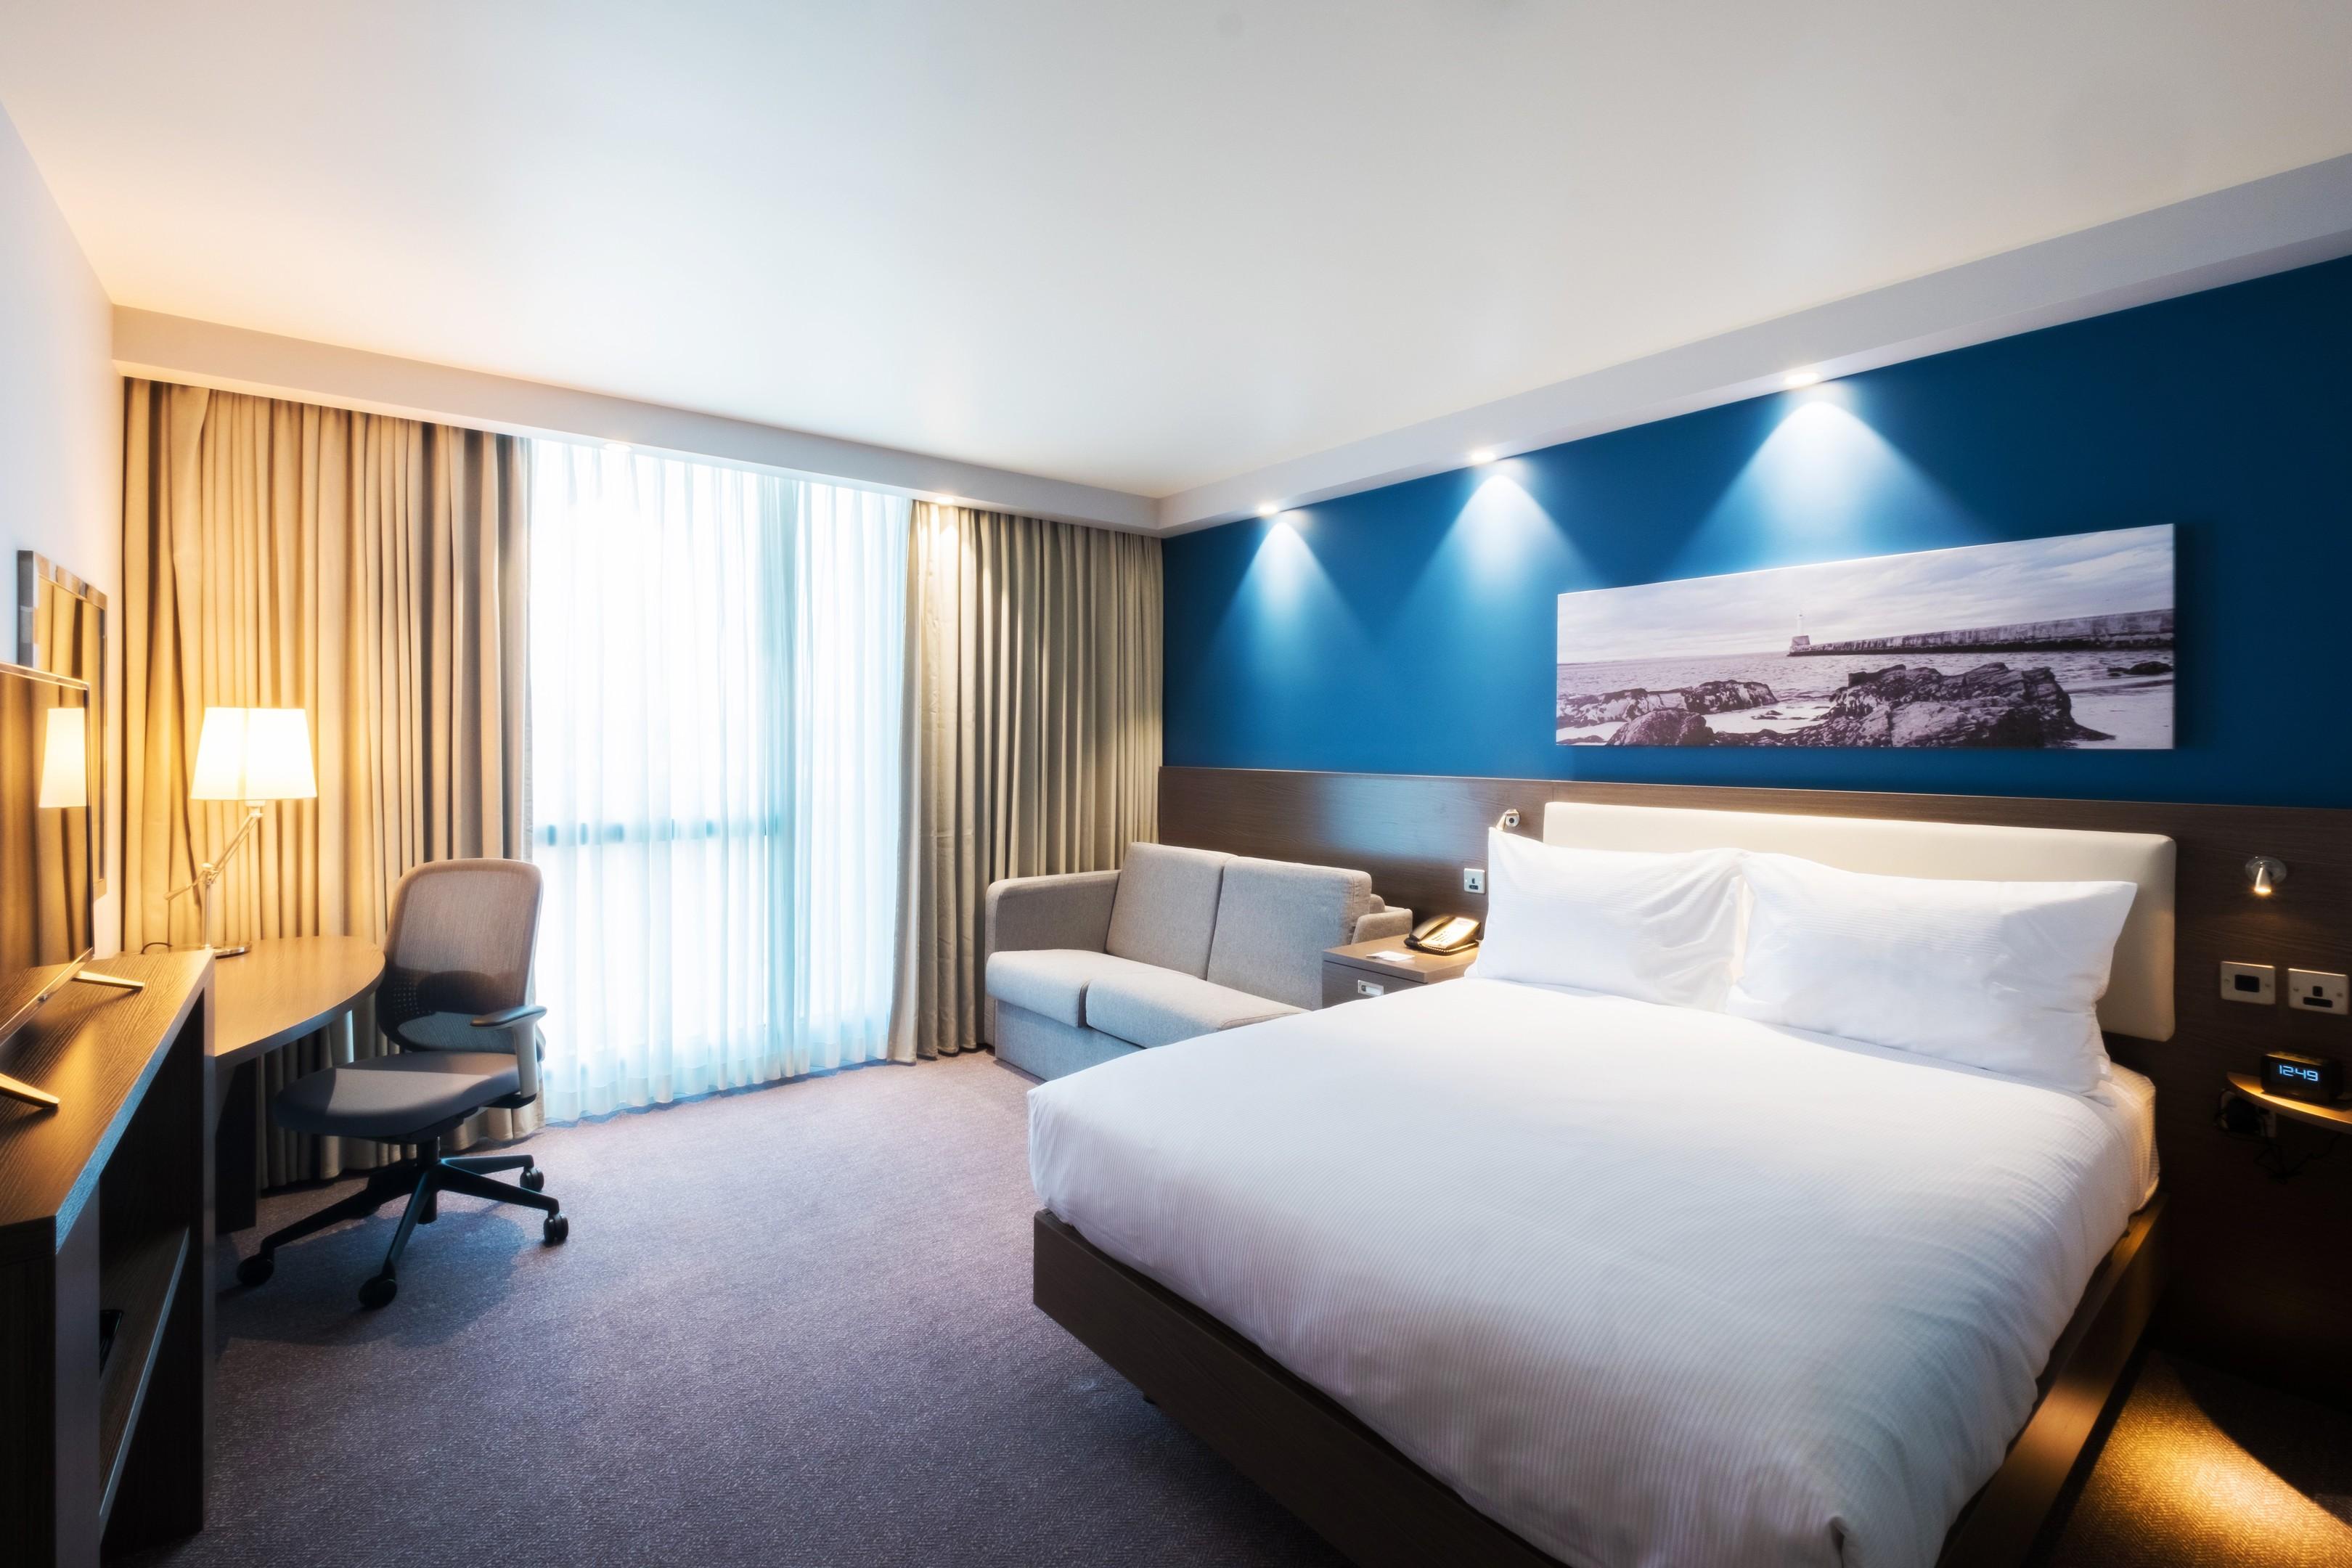 Hilton Aberdeen (Evoke Pictures)